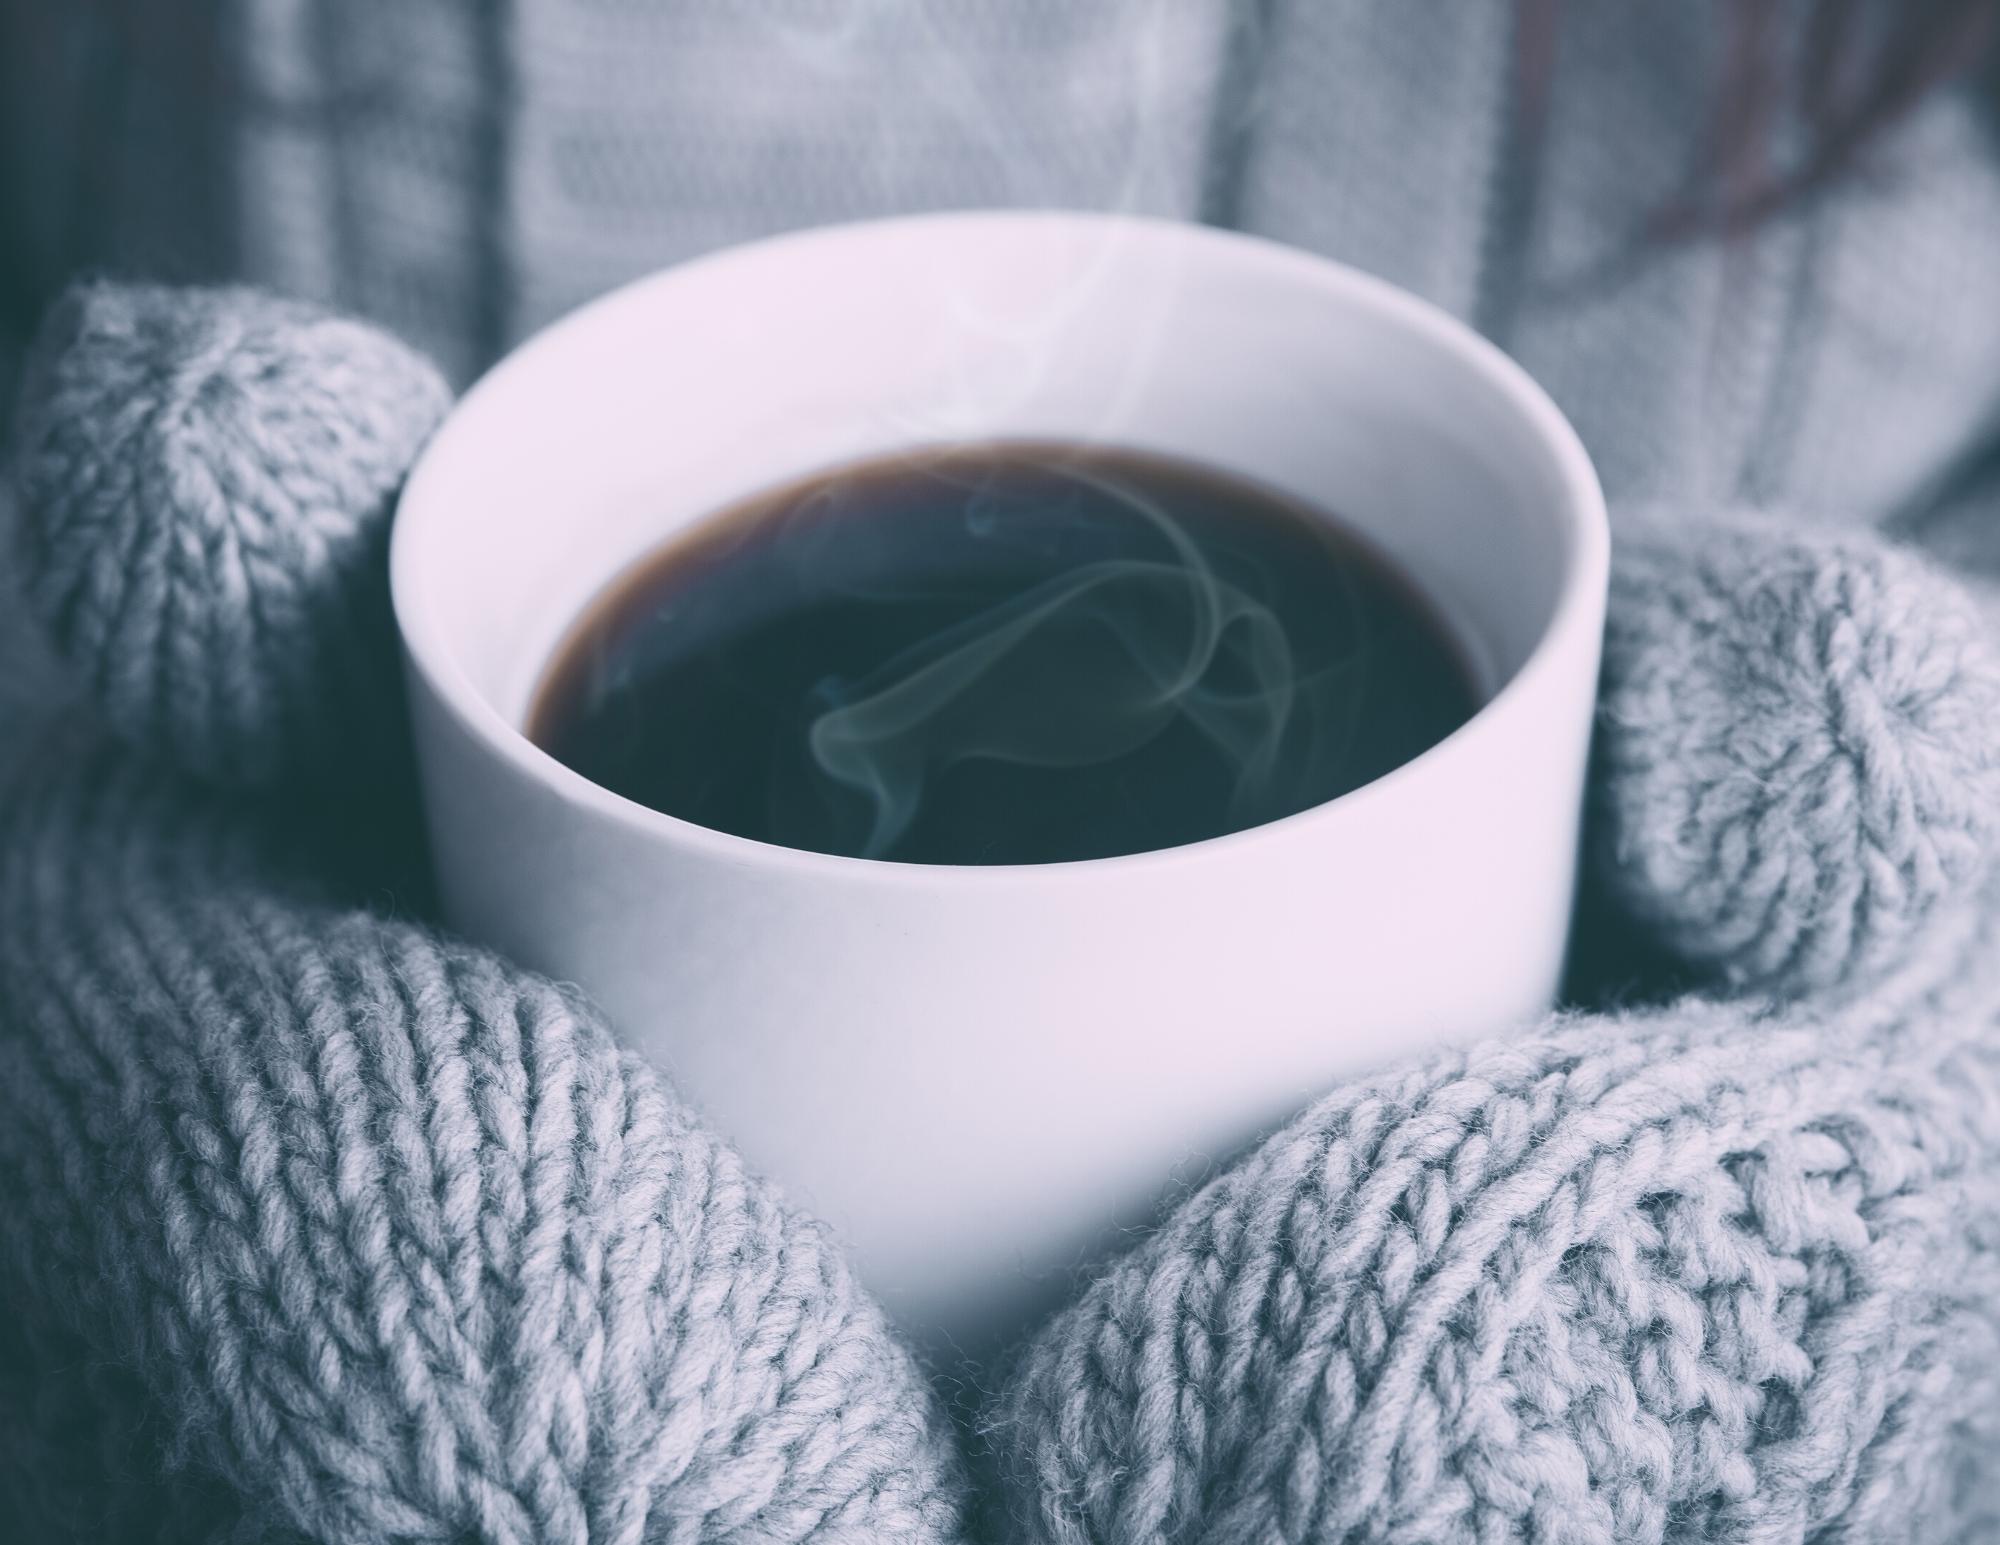 Warm-Up Wednesdays